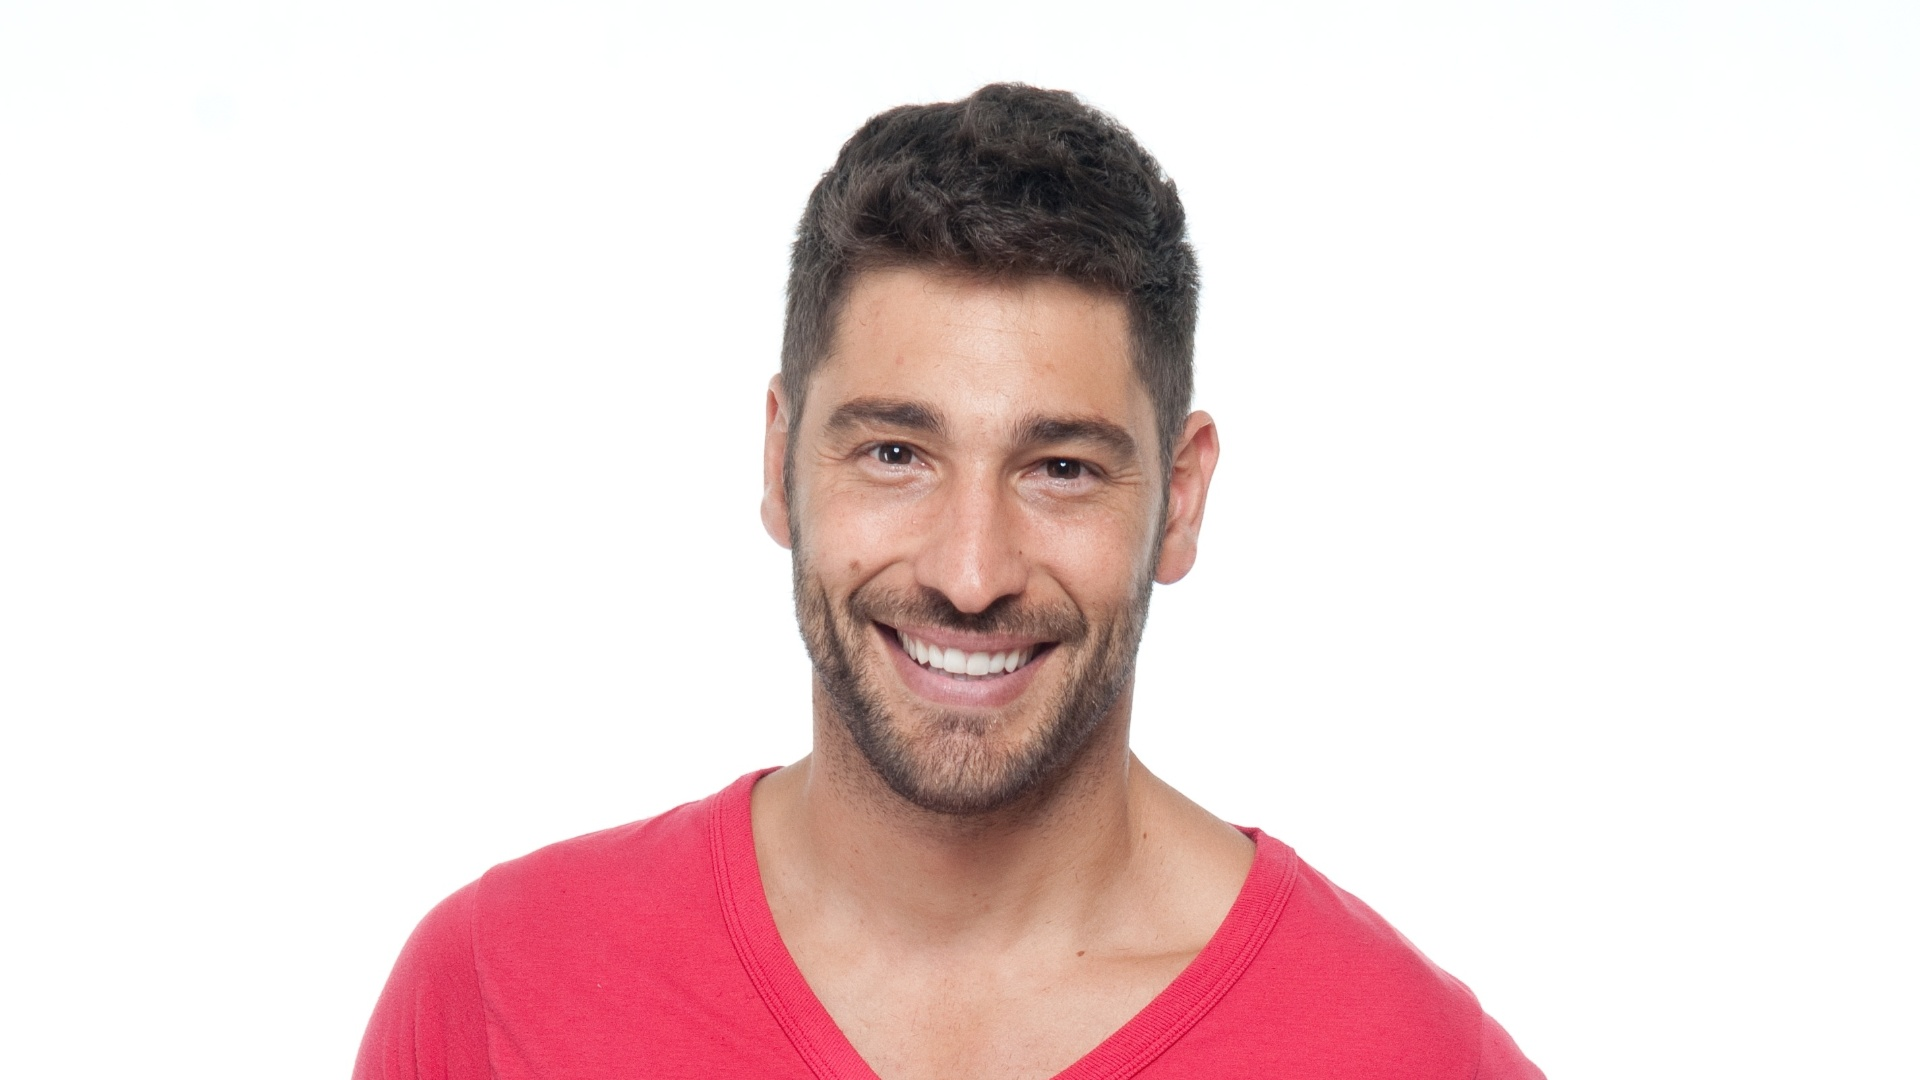 O ator Victor Pecoraro mudou o visual para